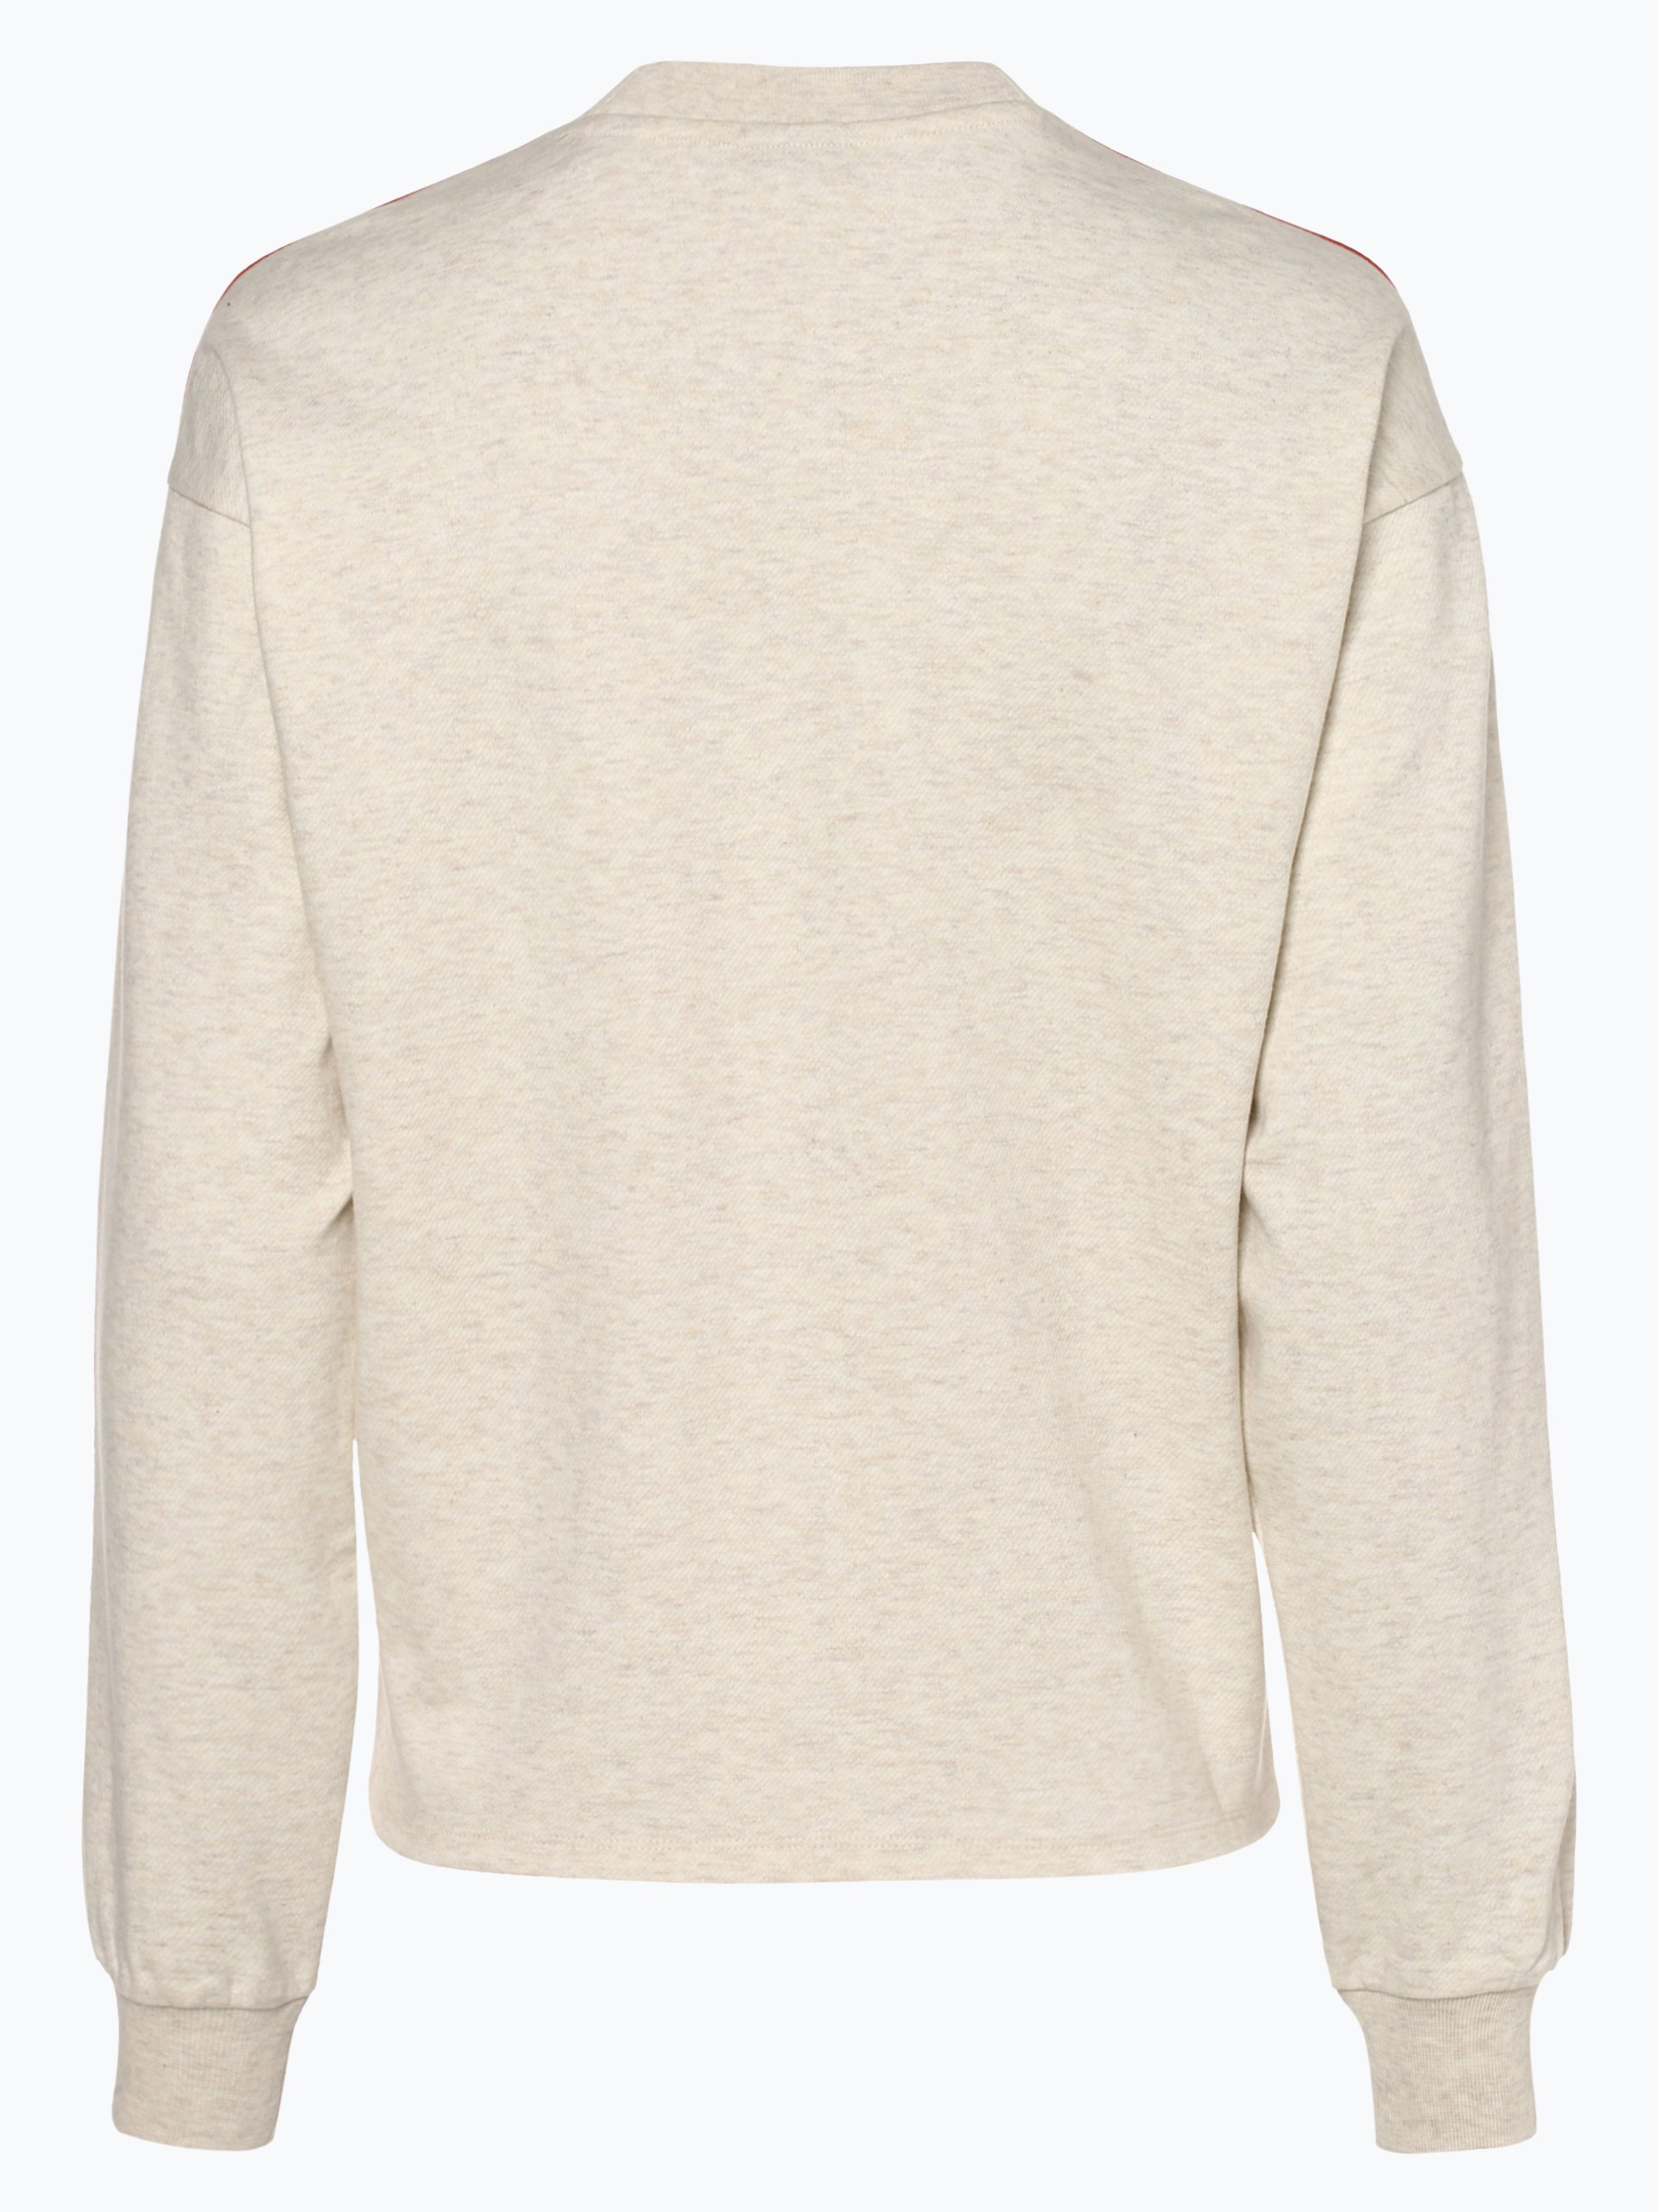 Scotch & Soda Damen Sweatshirt